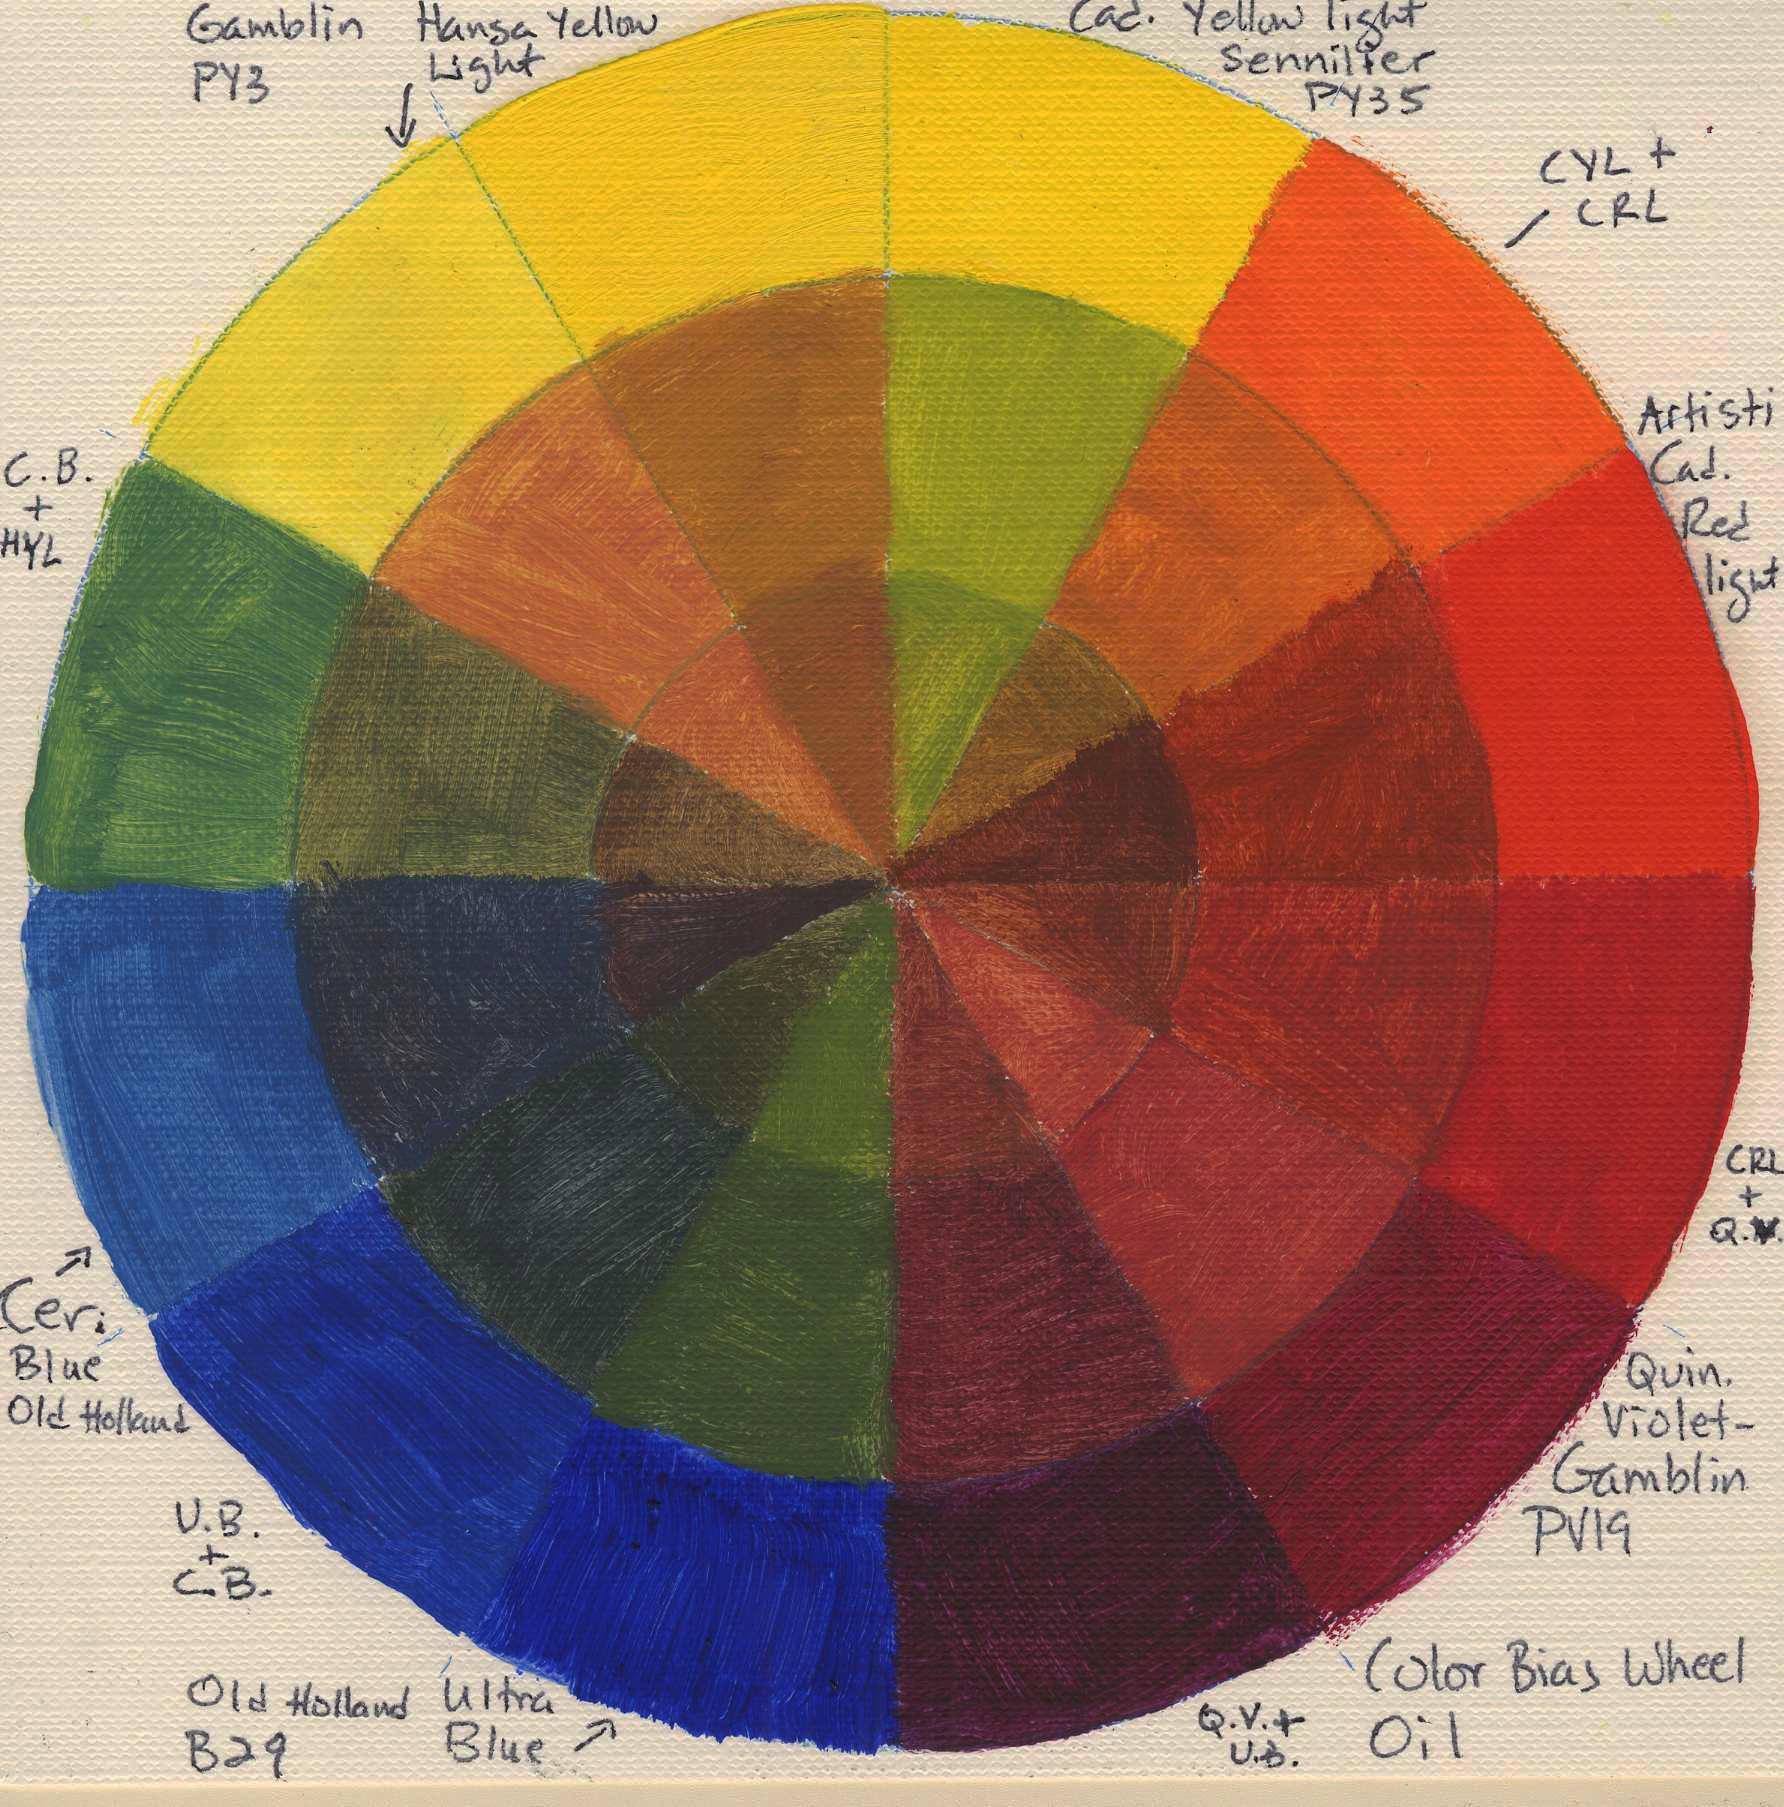 Color-mixing-chart-Oils-6-color-1030